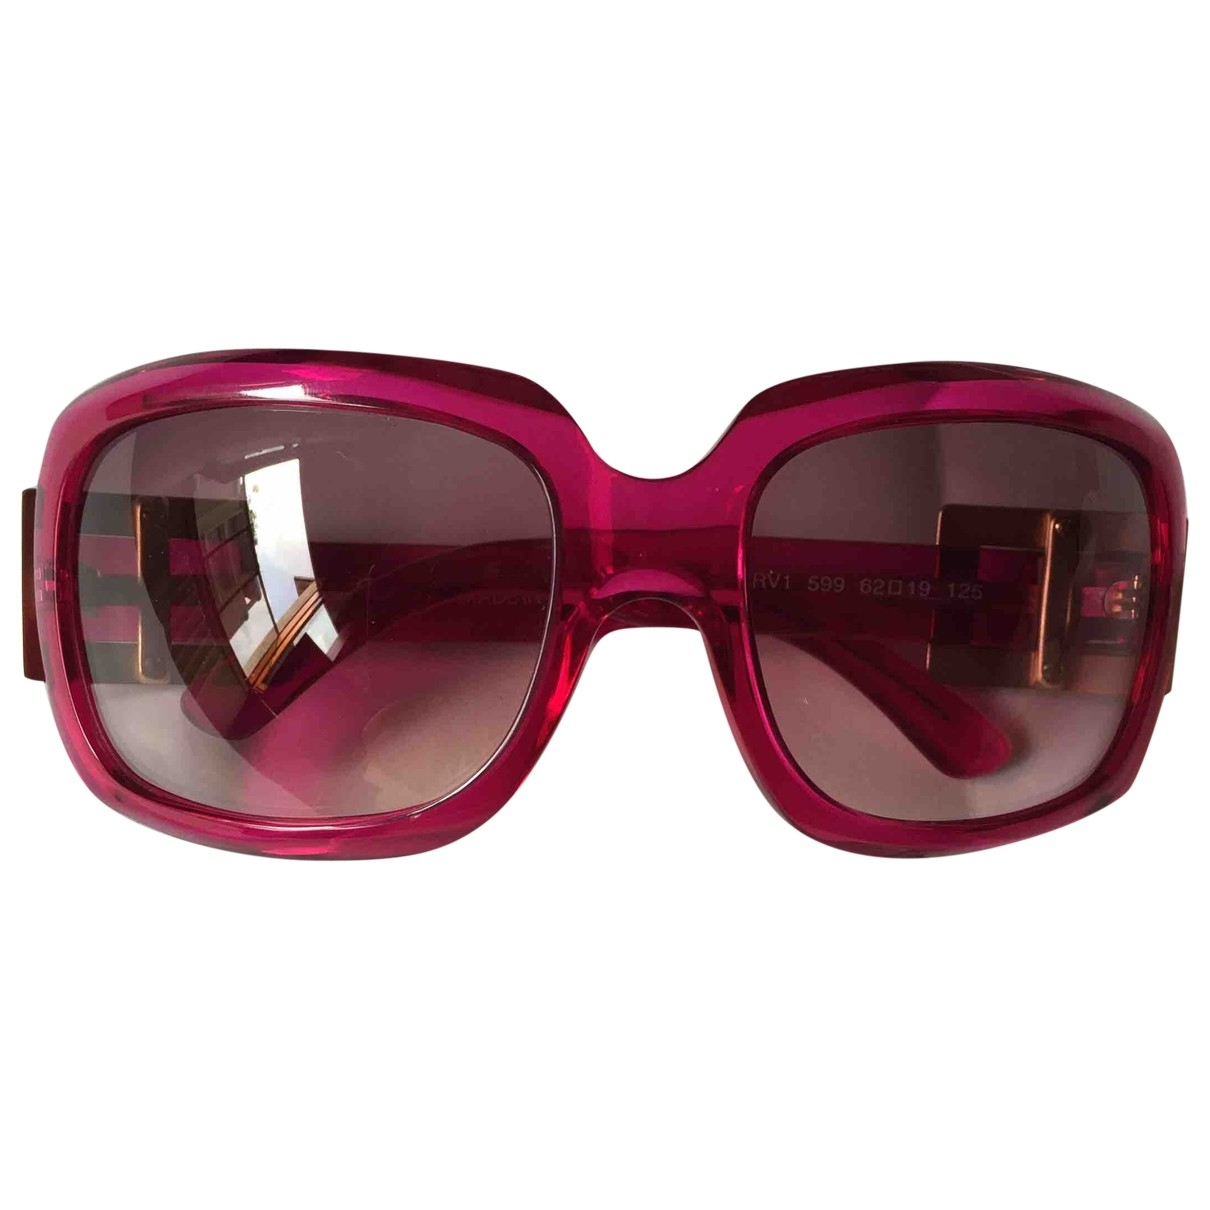 Gafas oversize Roger Vivier